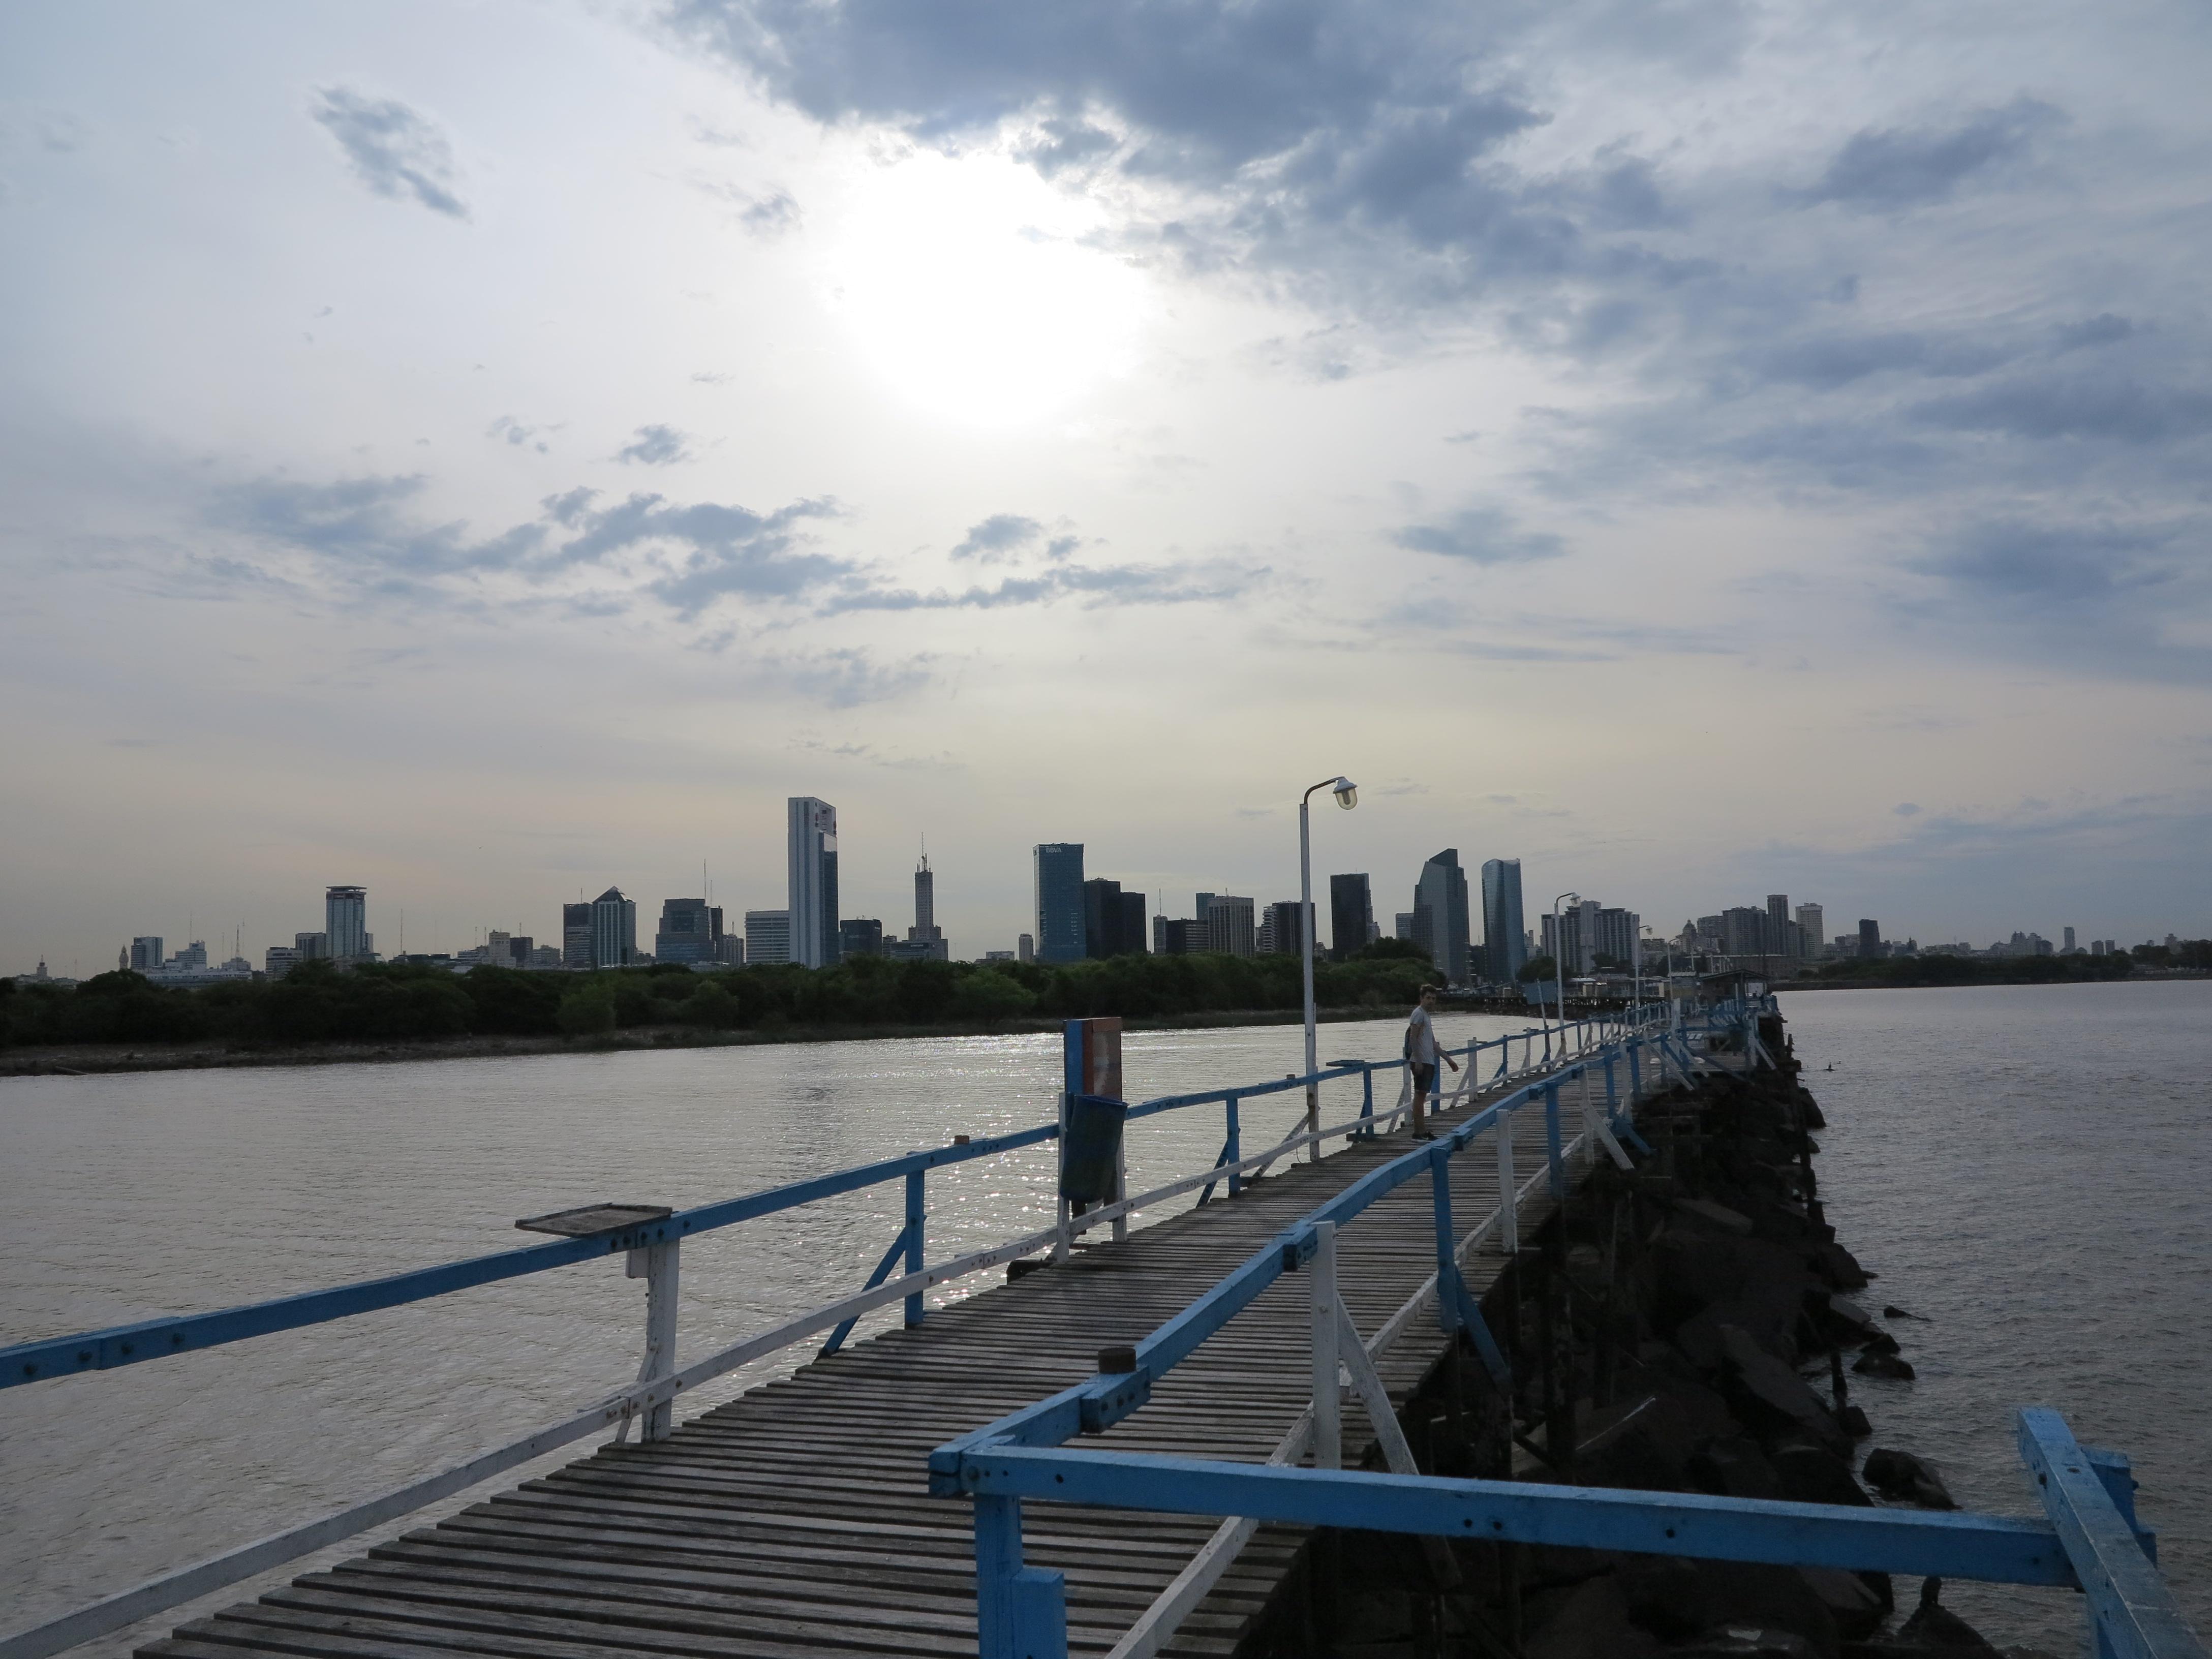 02.12.16 Skyline vom Steg